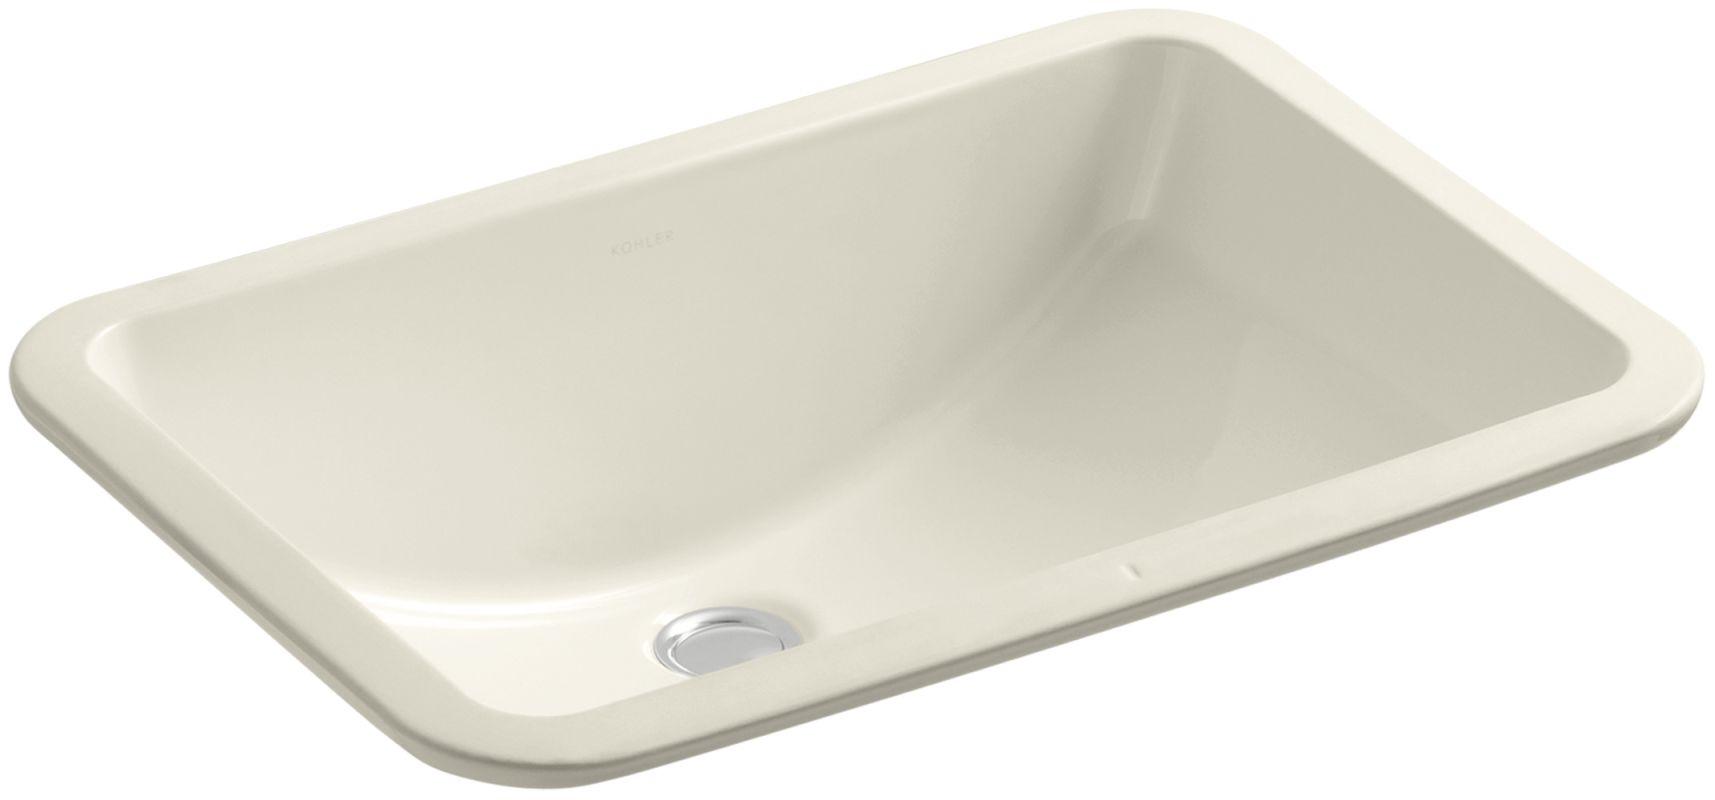 Kohler K 2214 G 47 Almond Ladena 18 3 8 Undermount Bathroom Sink